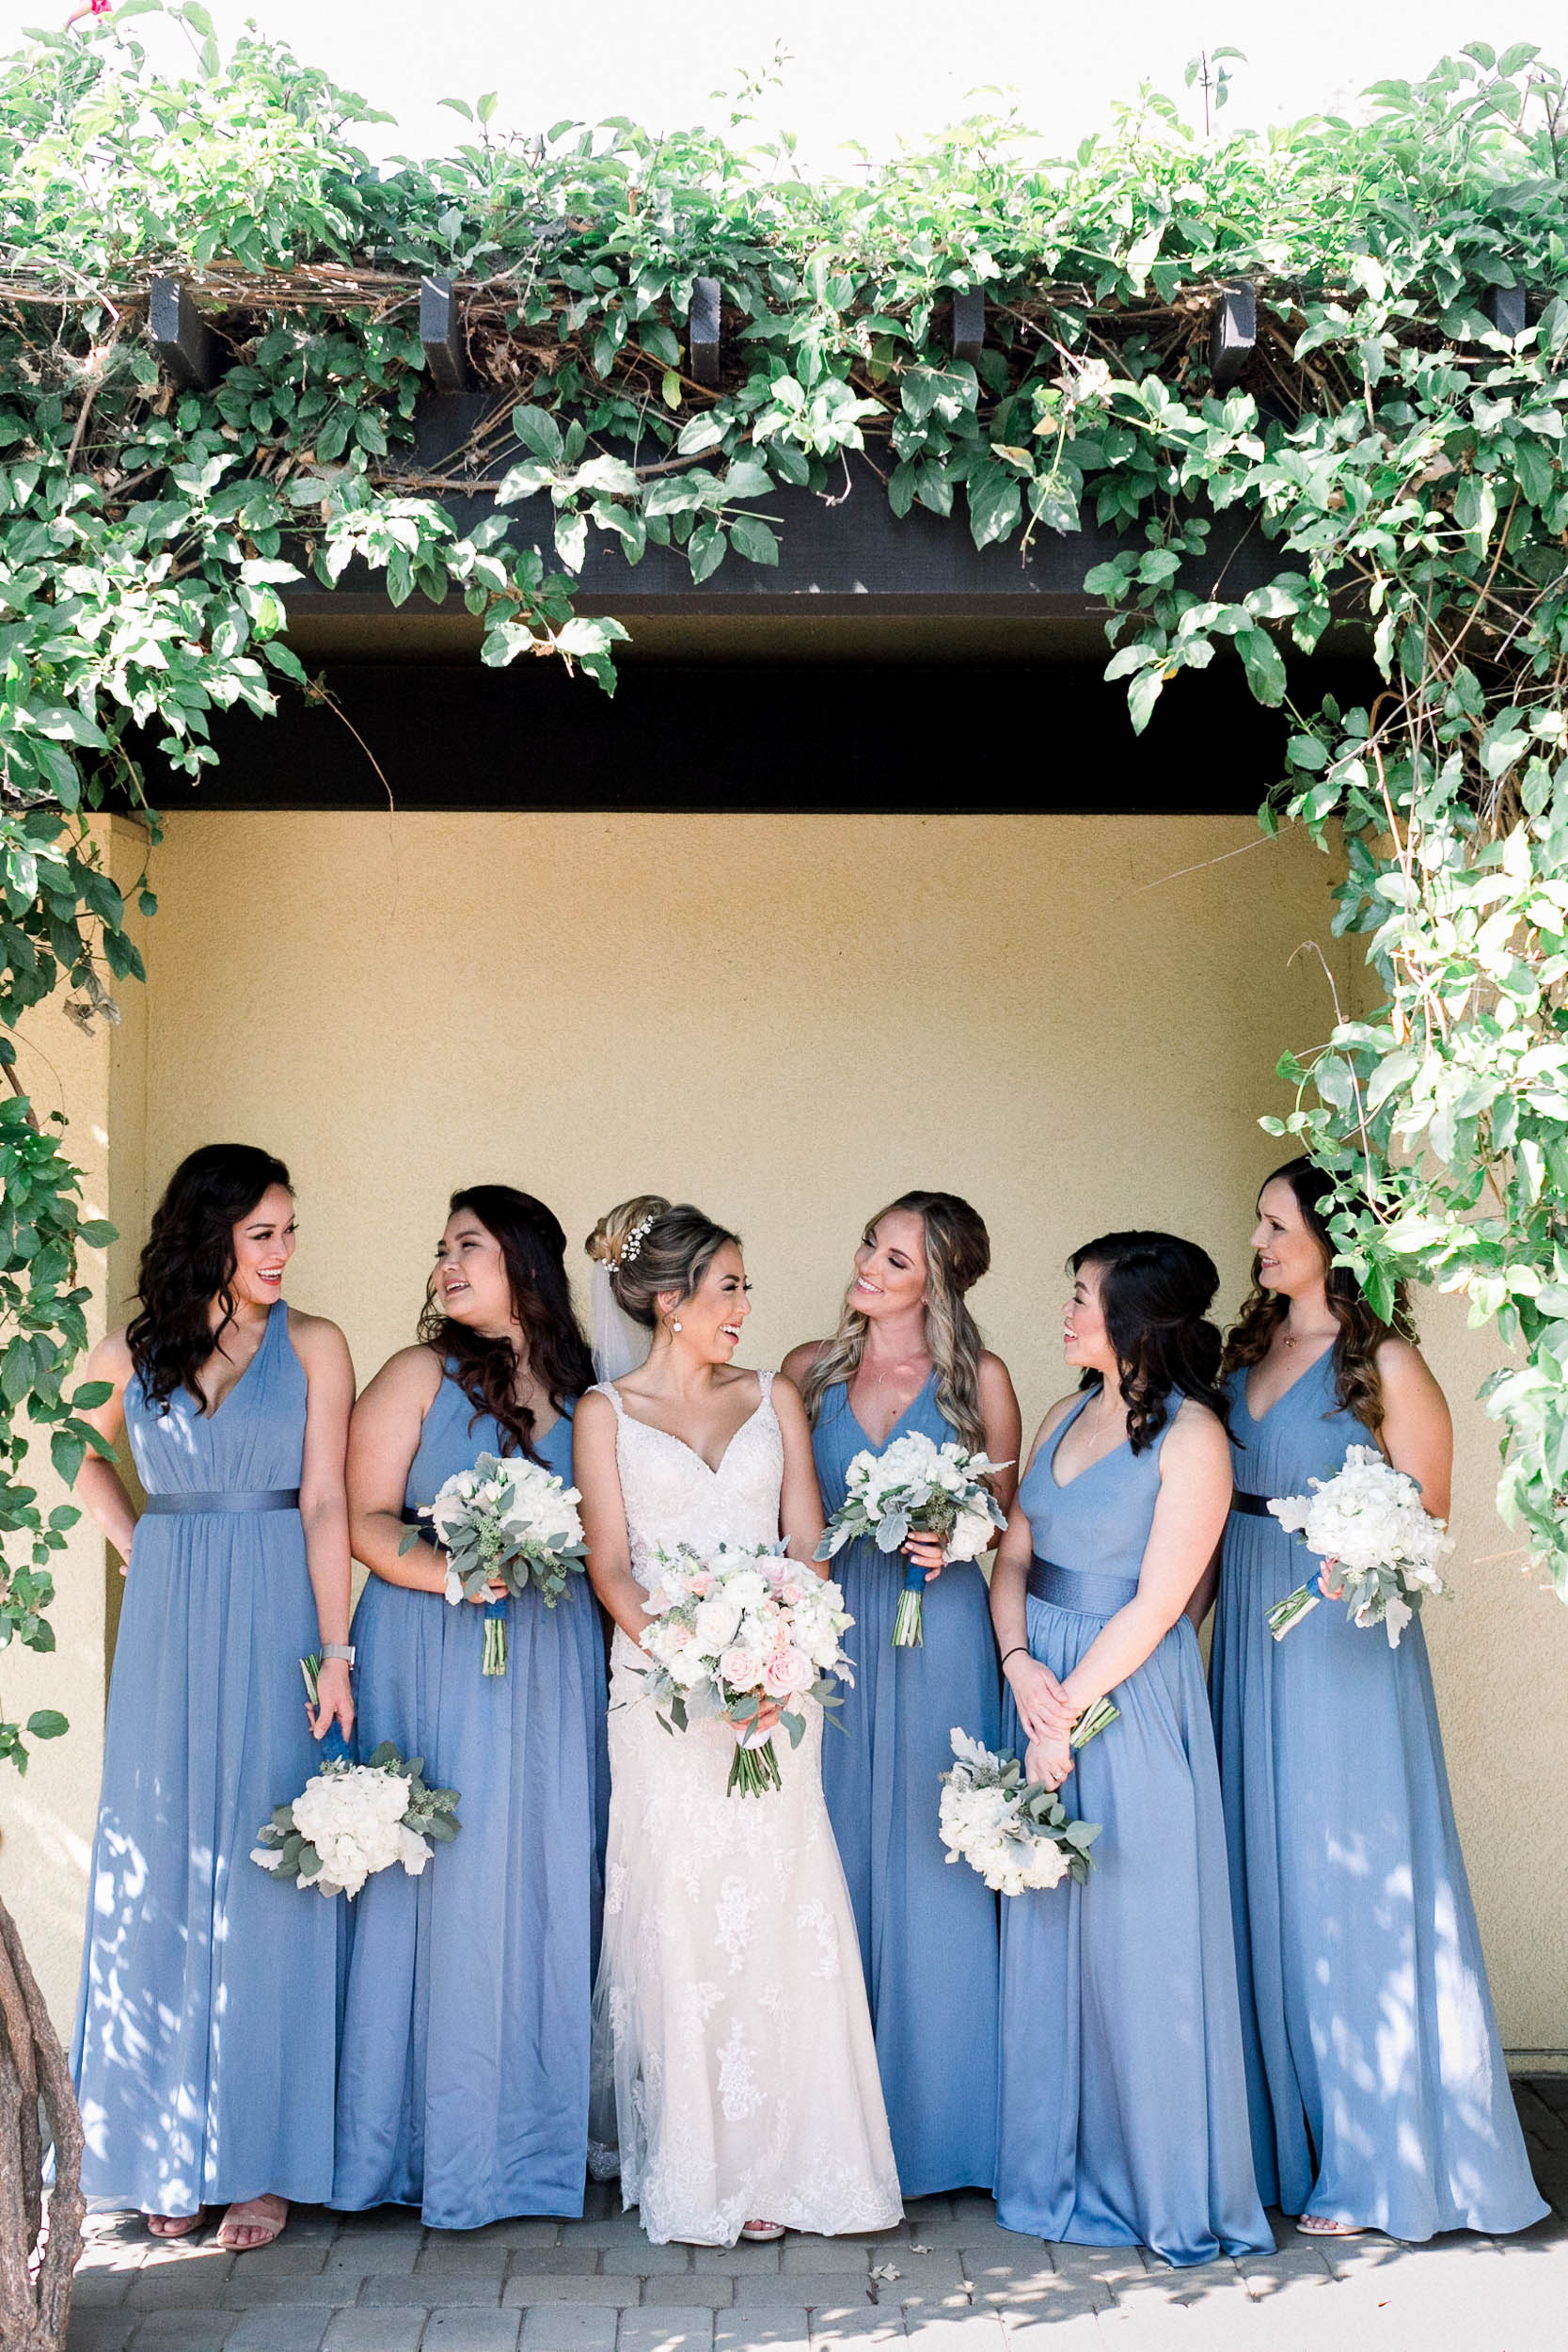 Las Positas Wedding_Buena Lane Photography_090118ER177.jpg